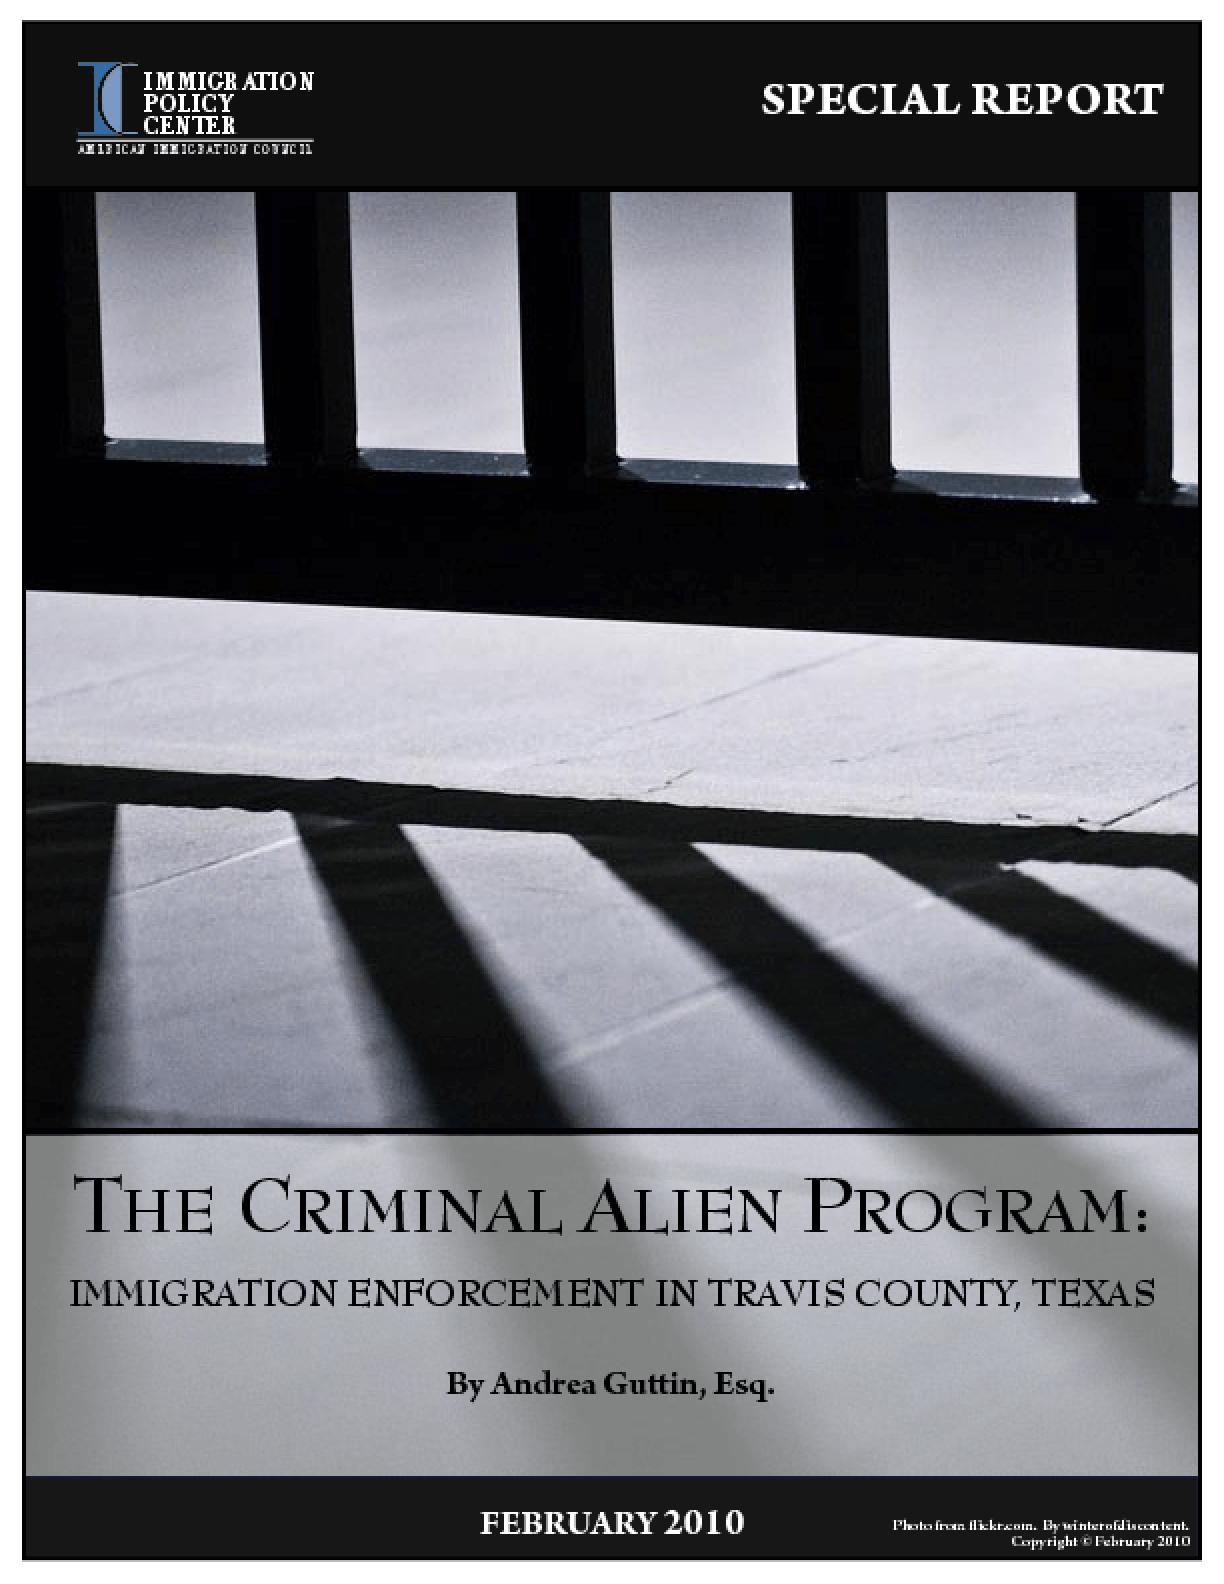 The Criminal Alien Program: Immigration Enforcement in Travis County, Texas